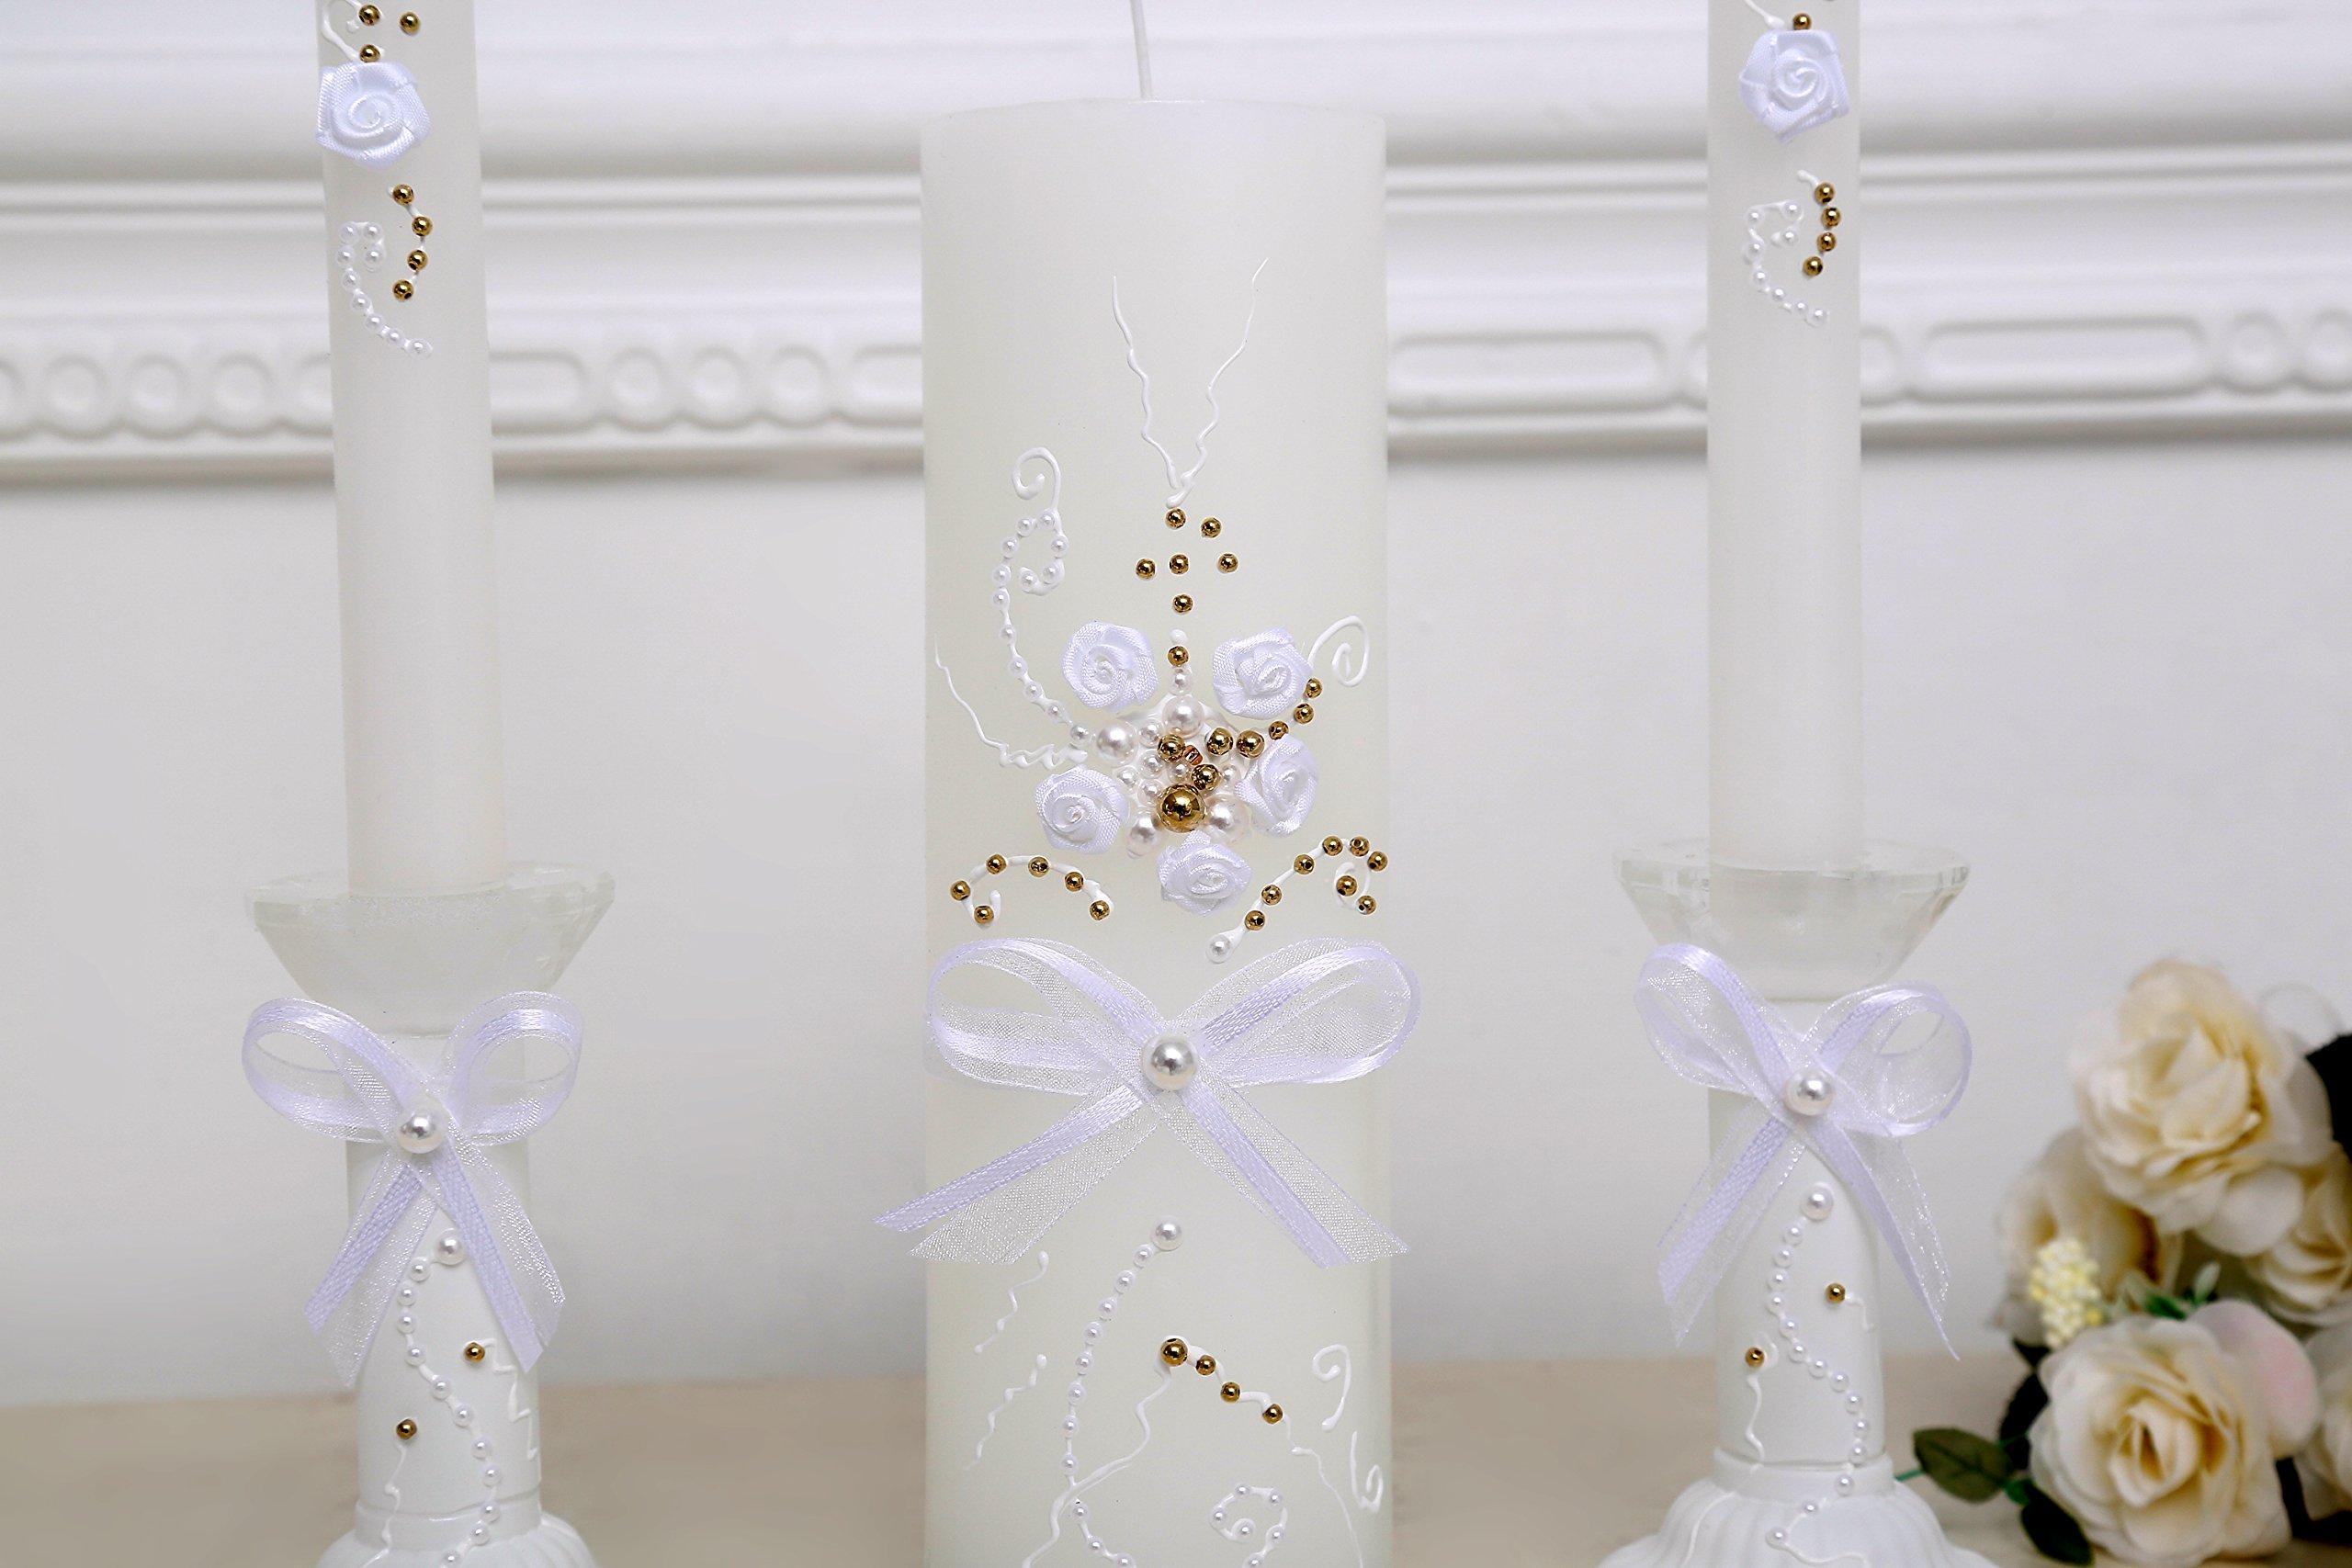 www.Beadingsupplys.com Unity Candle, Unity Wedding Candle Set, Gold and White plears Decor, White Unity Candle Set with Glass candleholders